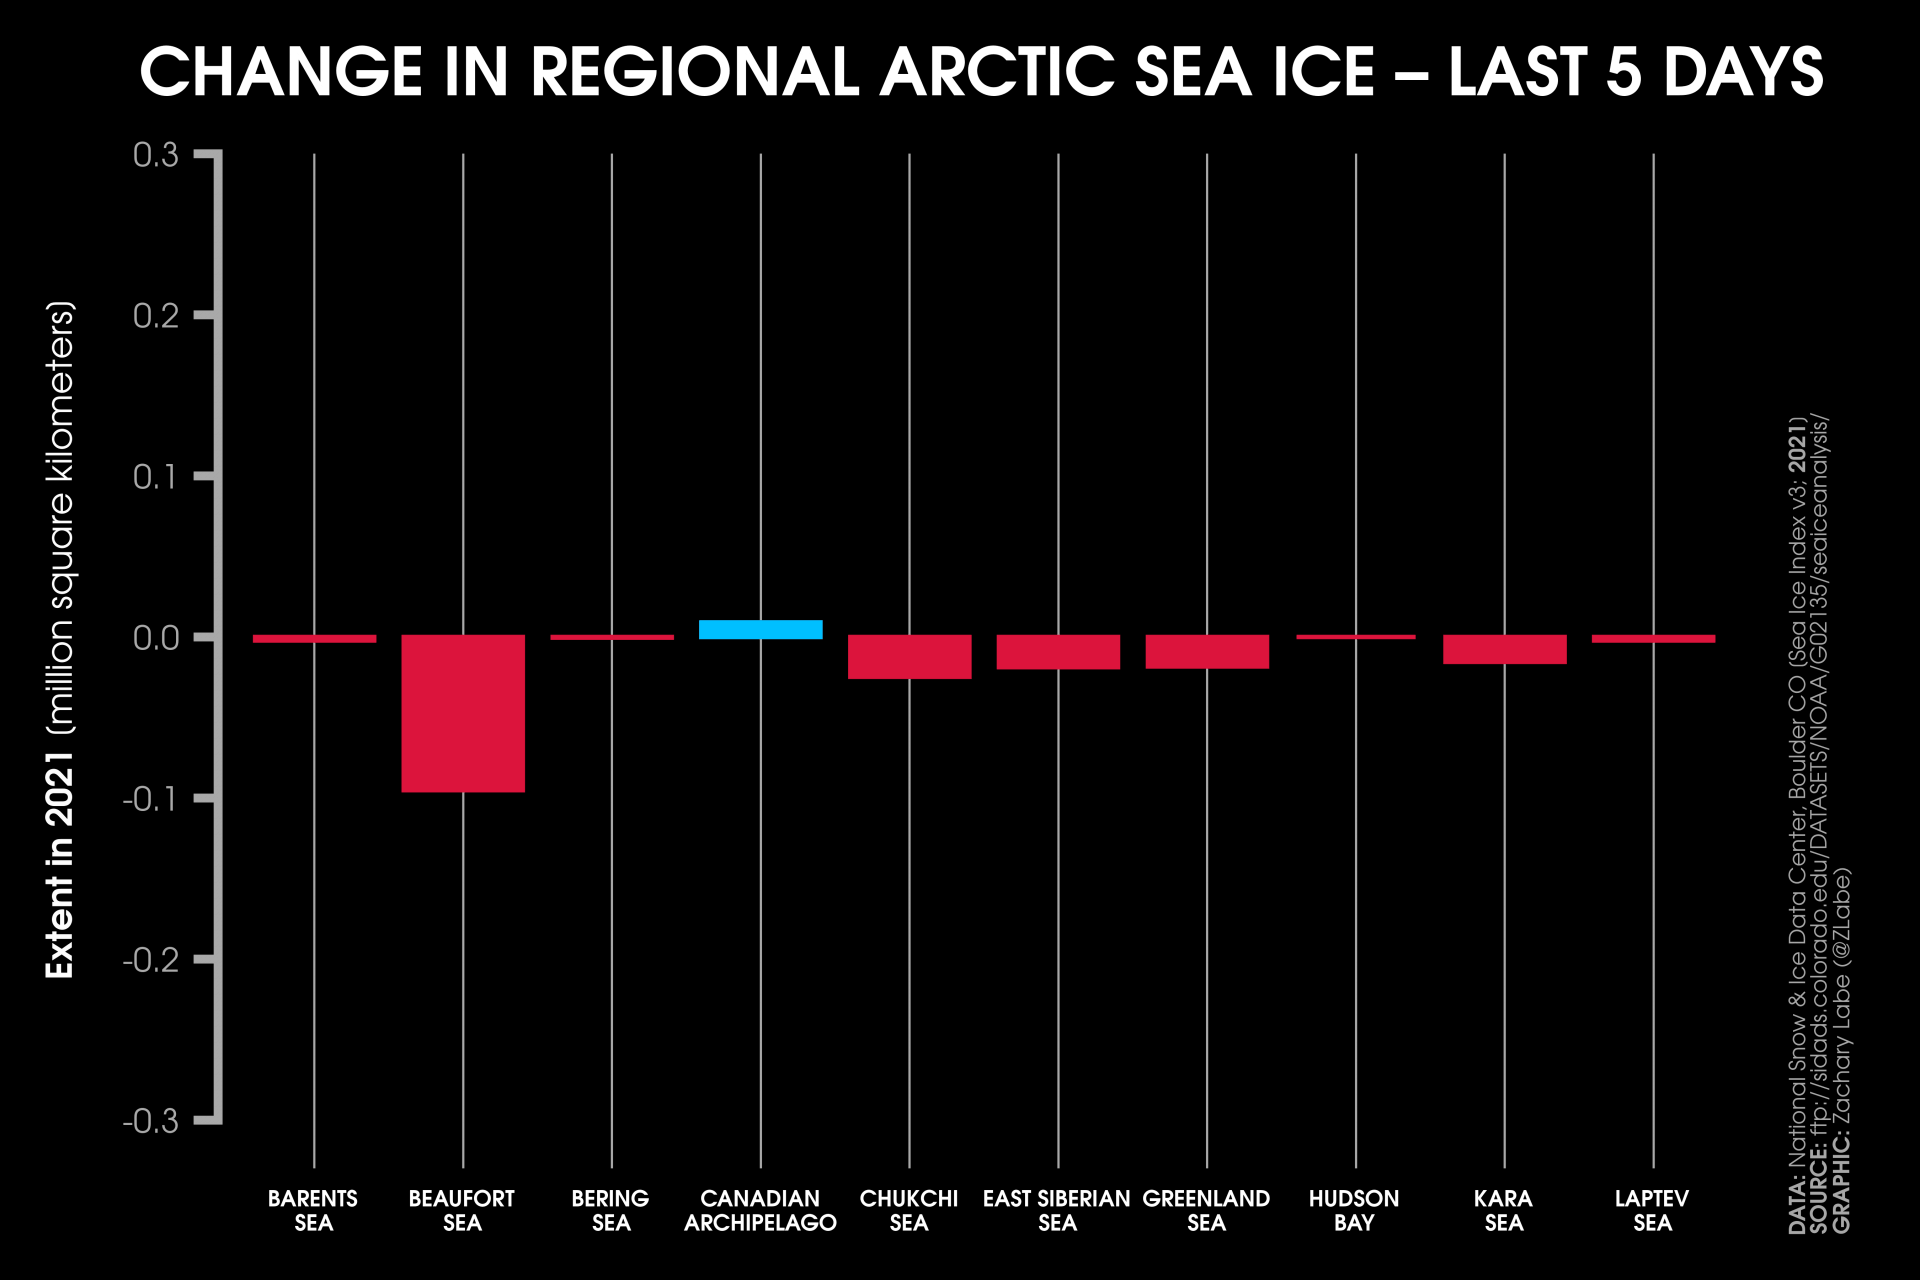 arctic-sea-ice-extent-5-day-area-change-regional